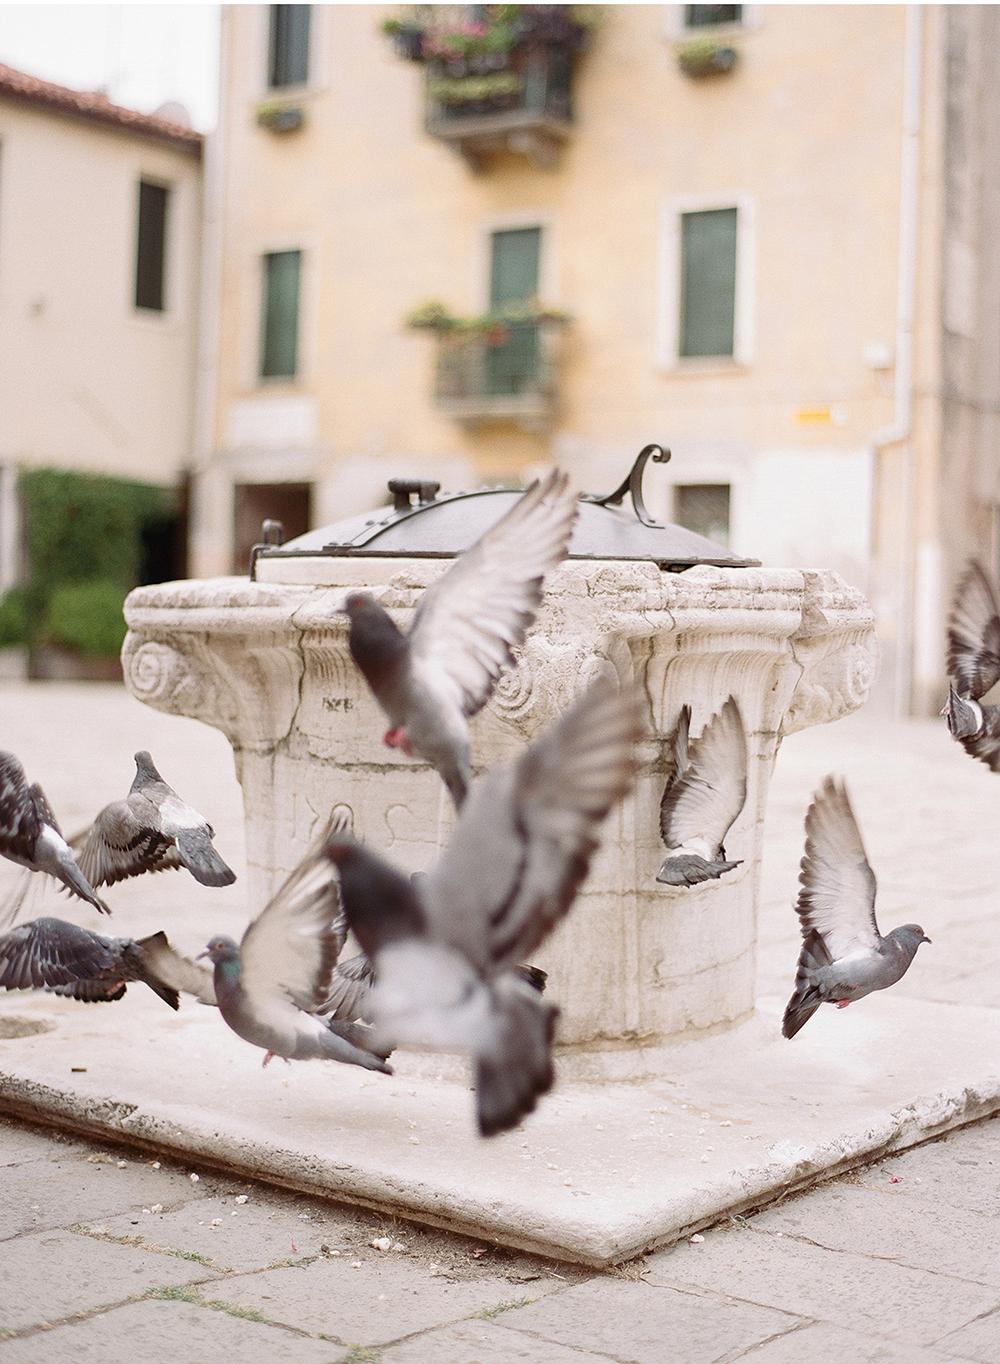 003_Venice.jpg